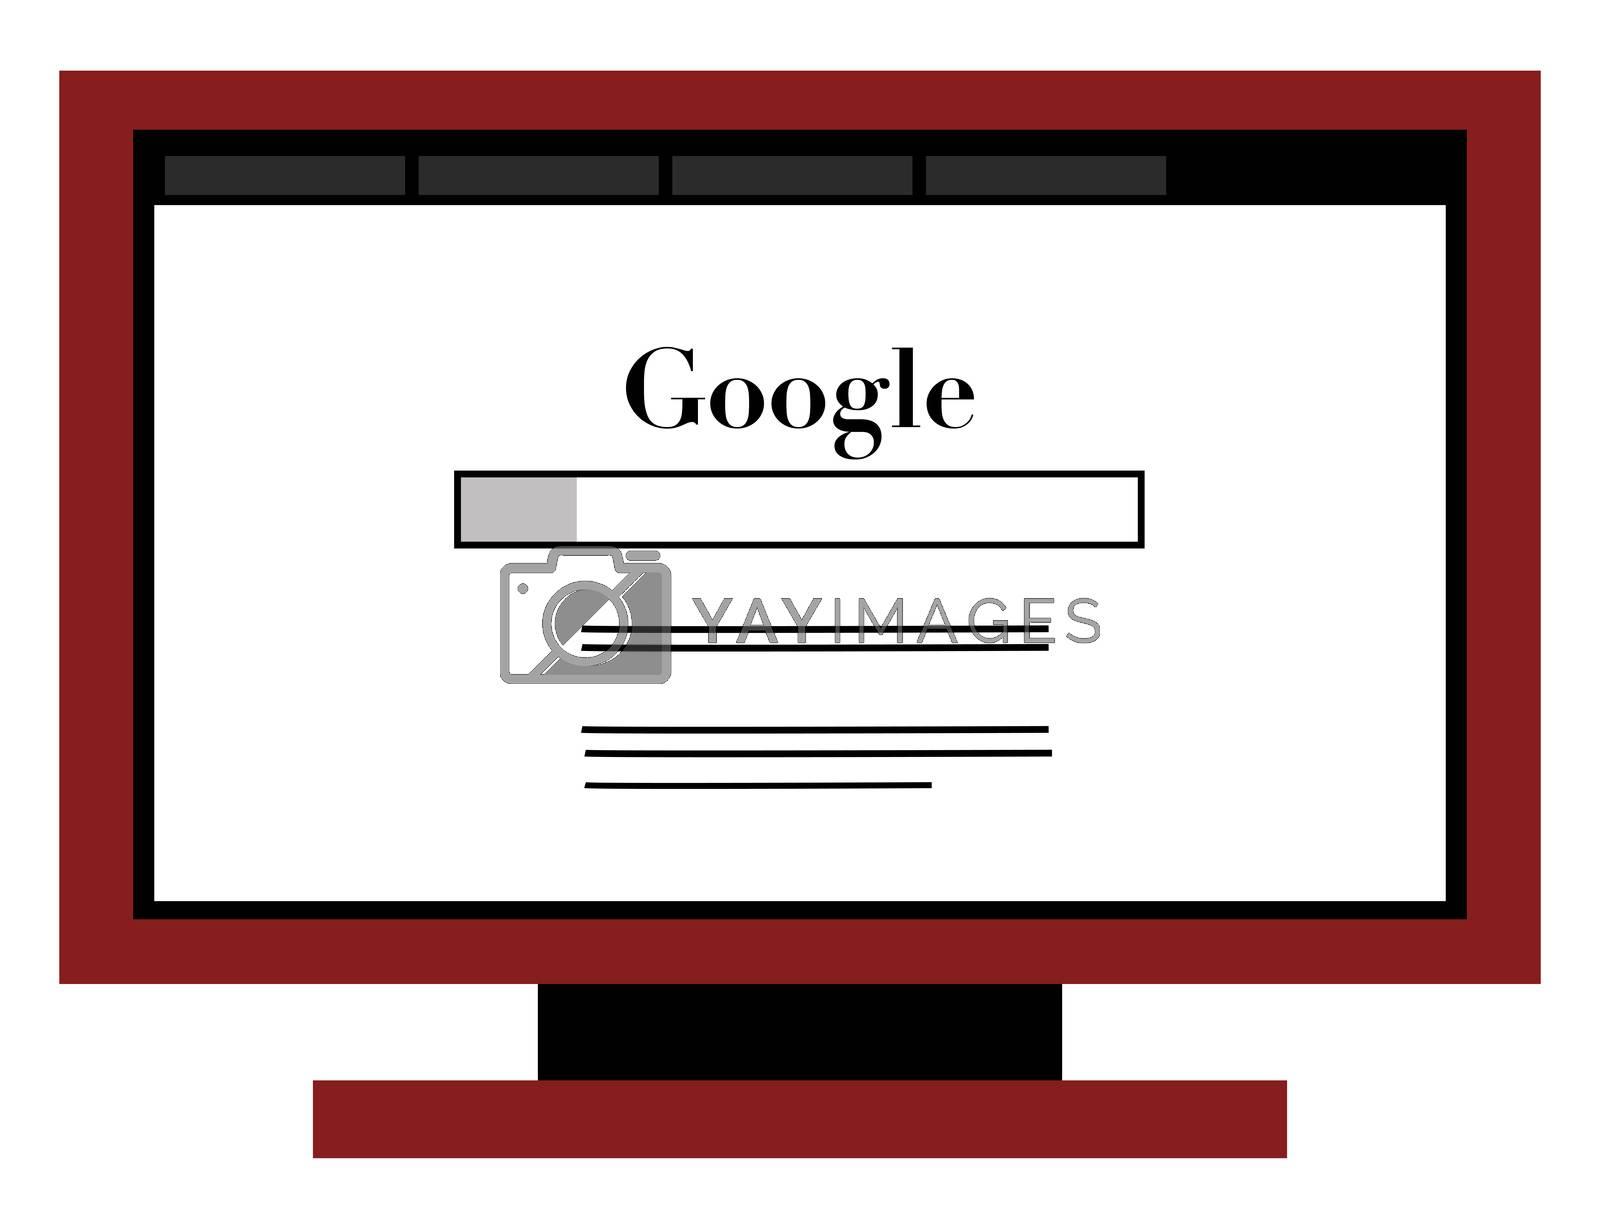 Google internet site, illustration, vector on white background